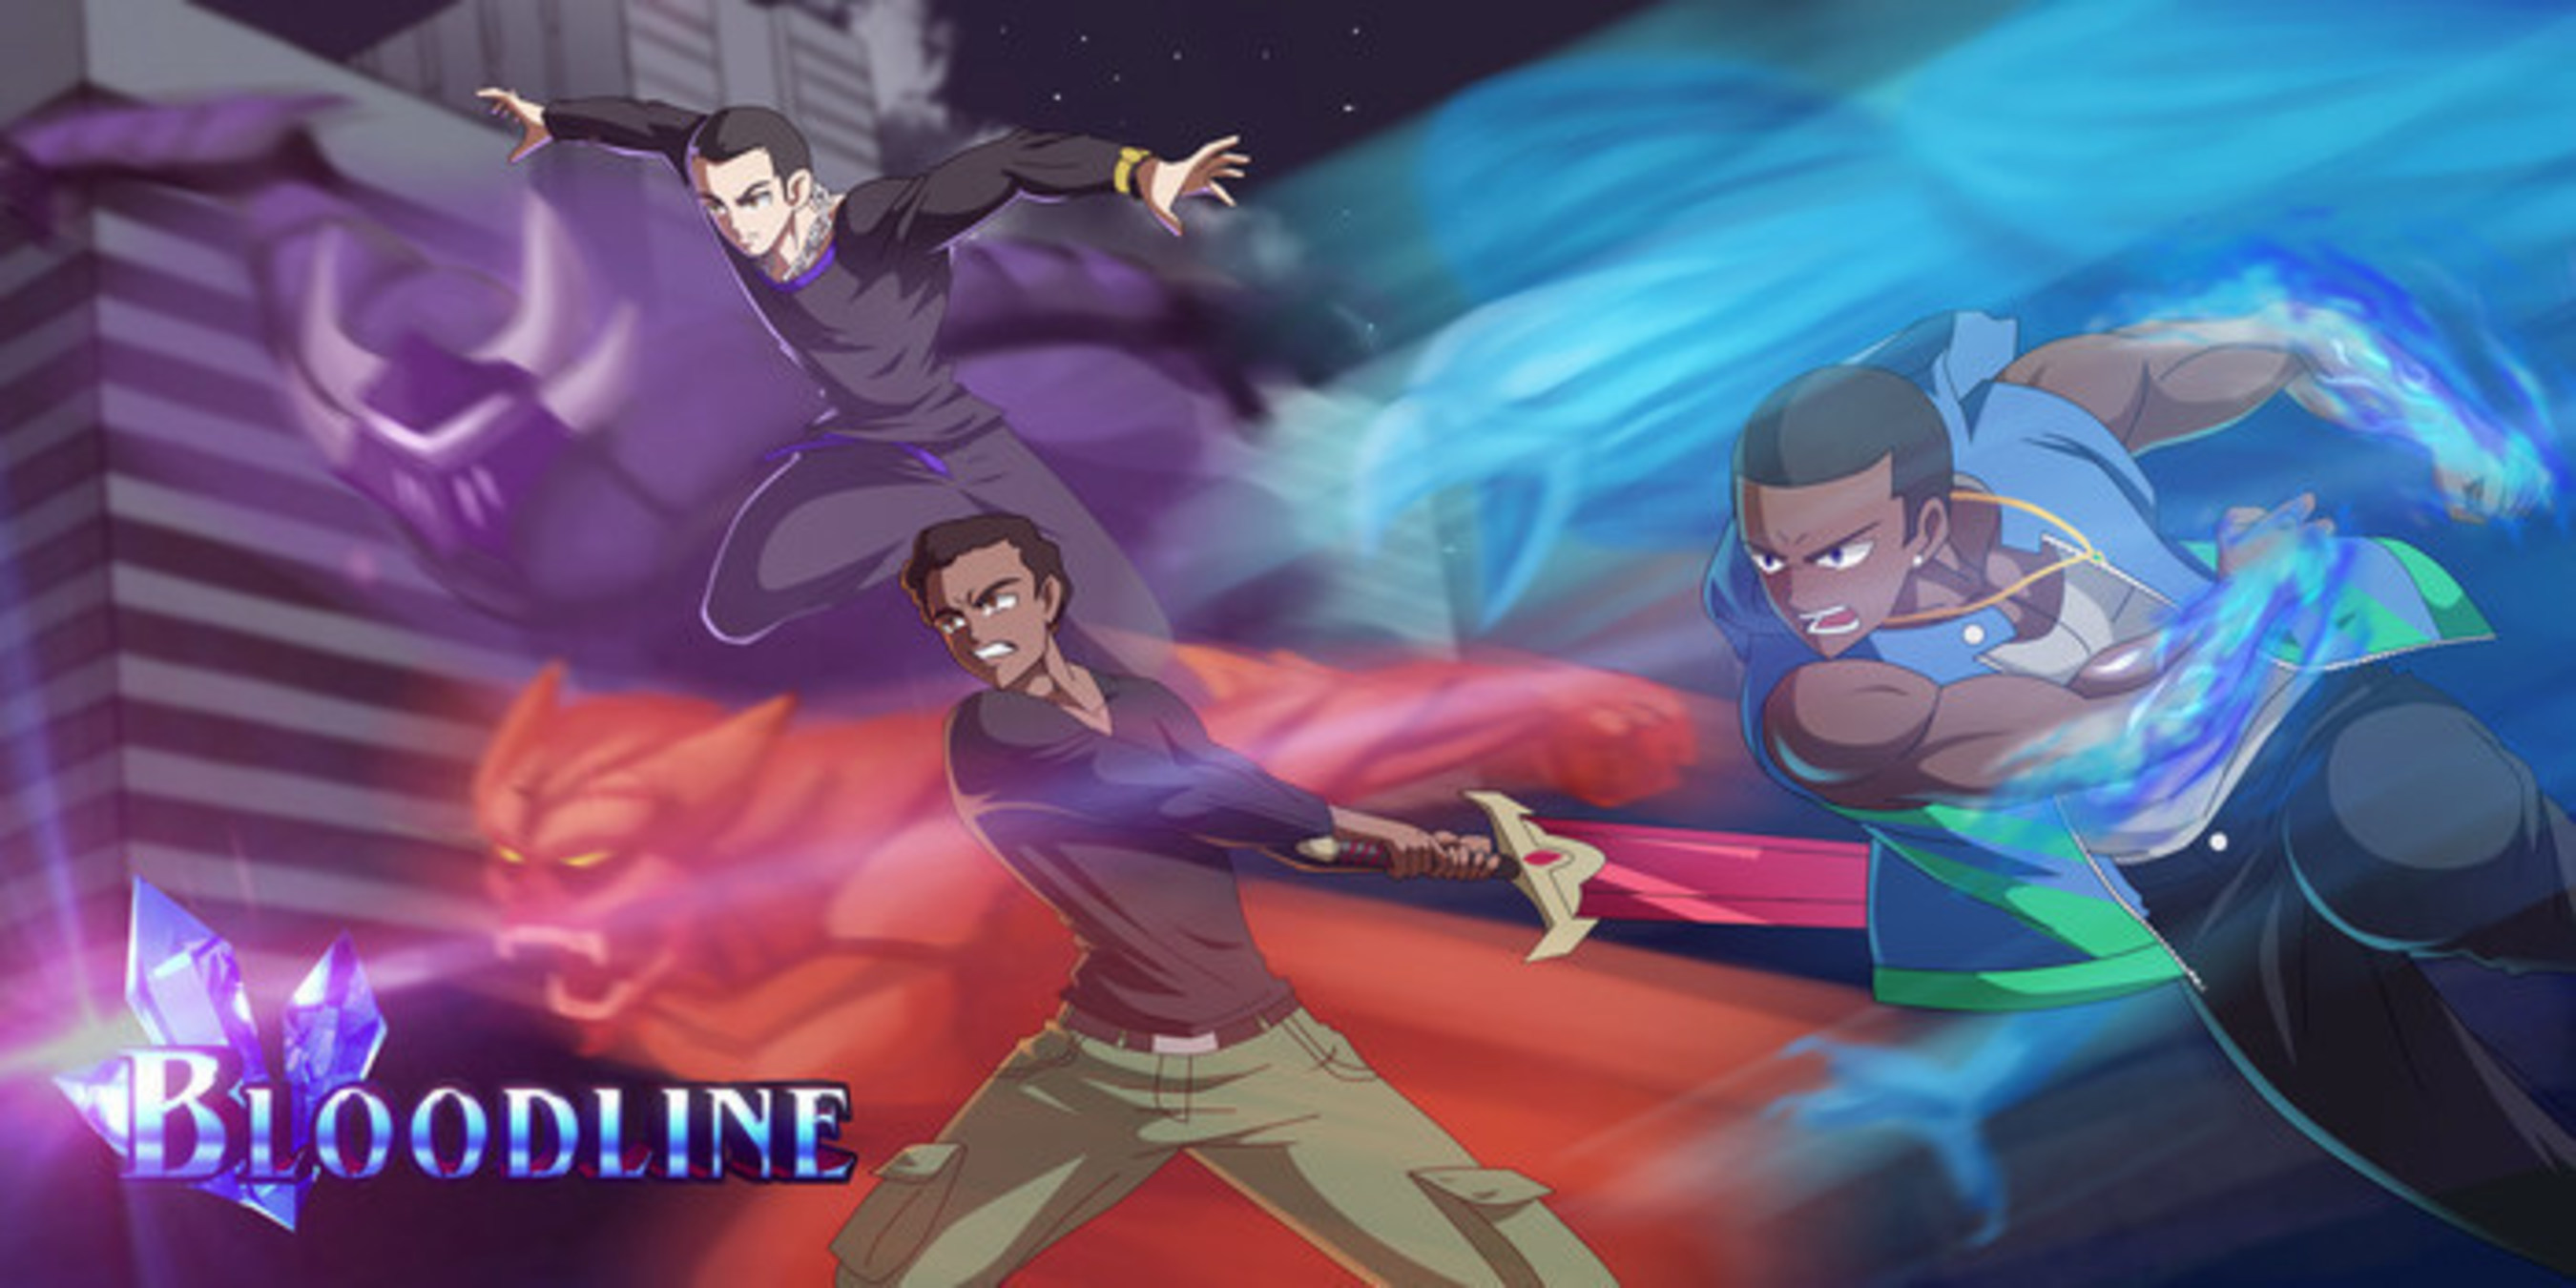 Anime Enthusiast Alphonso Blackwood Brings His Latest Animated Adventure to Kickstarter